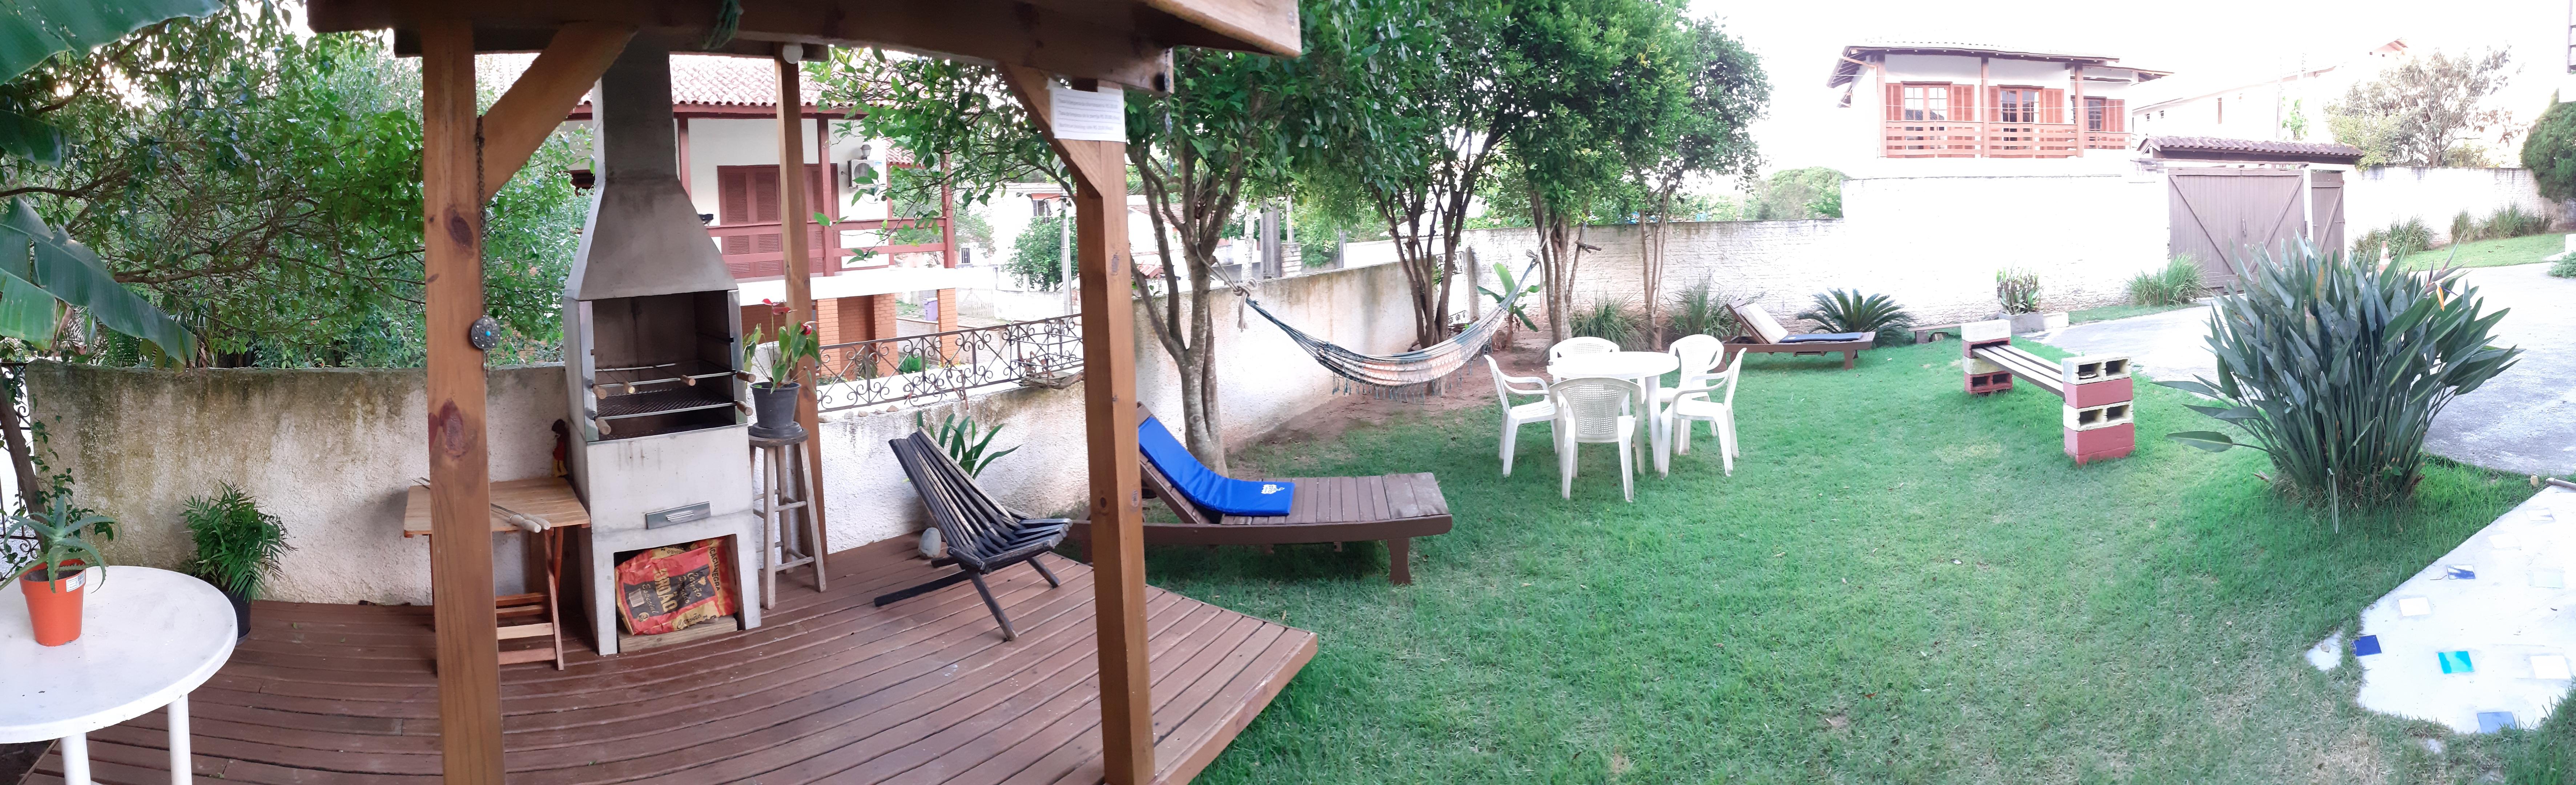 Foto 360º jardim, área social.